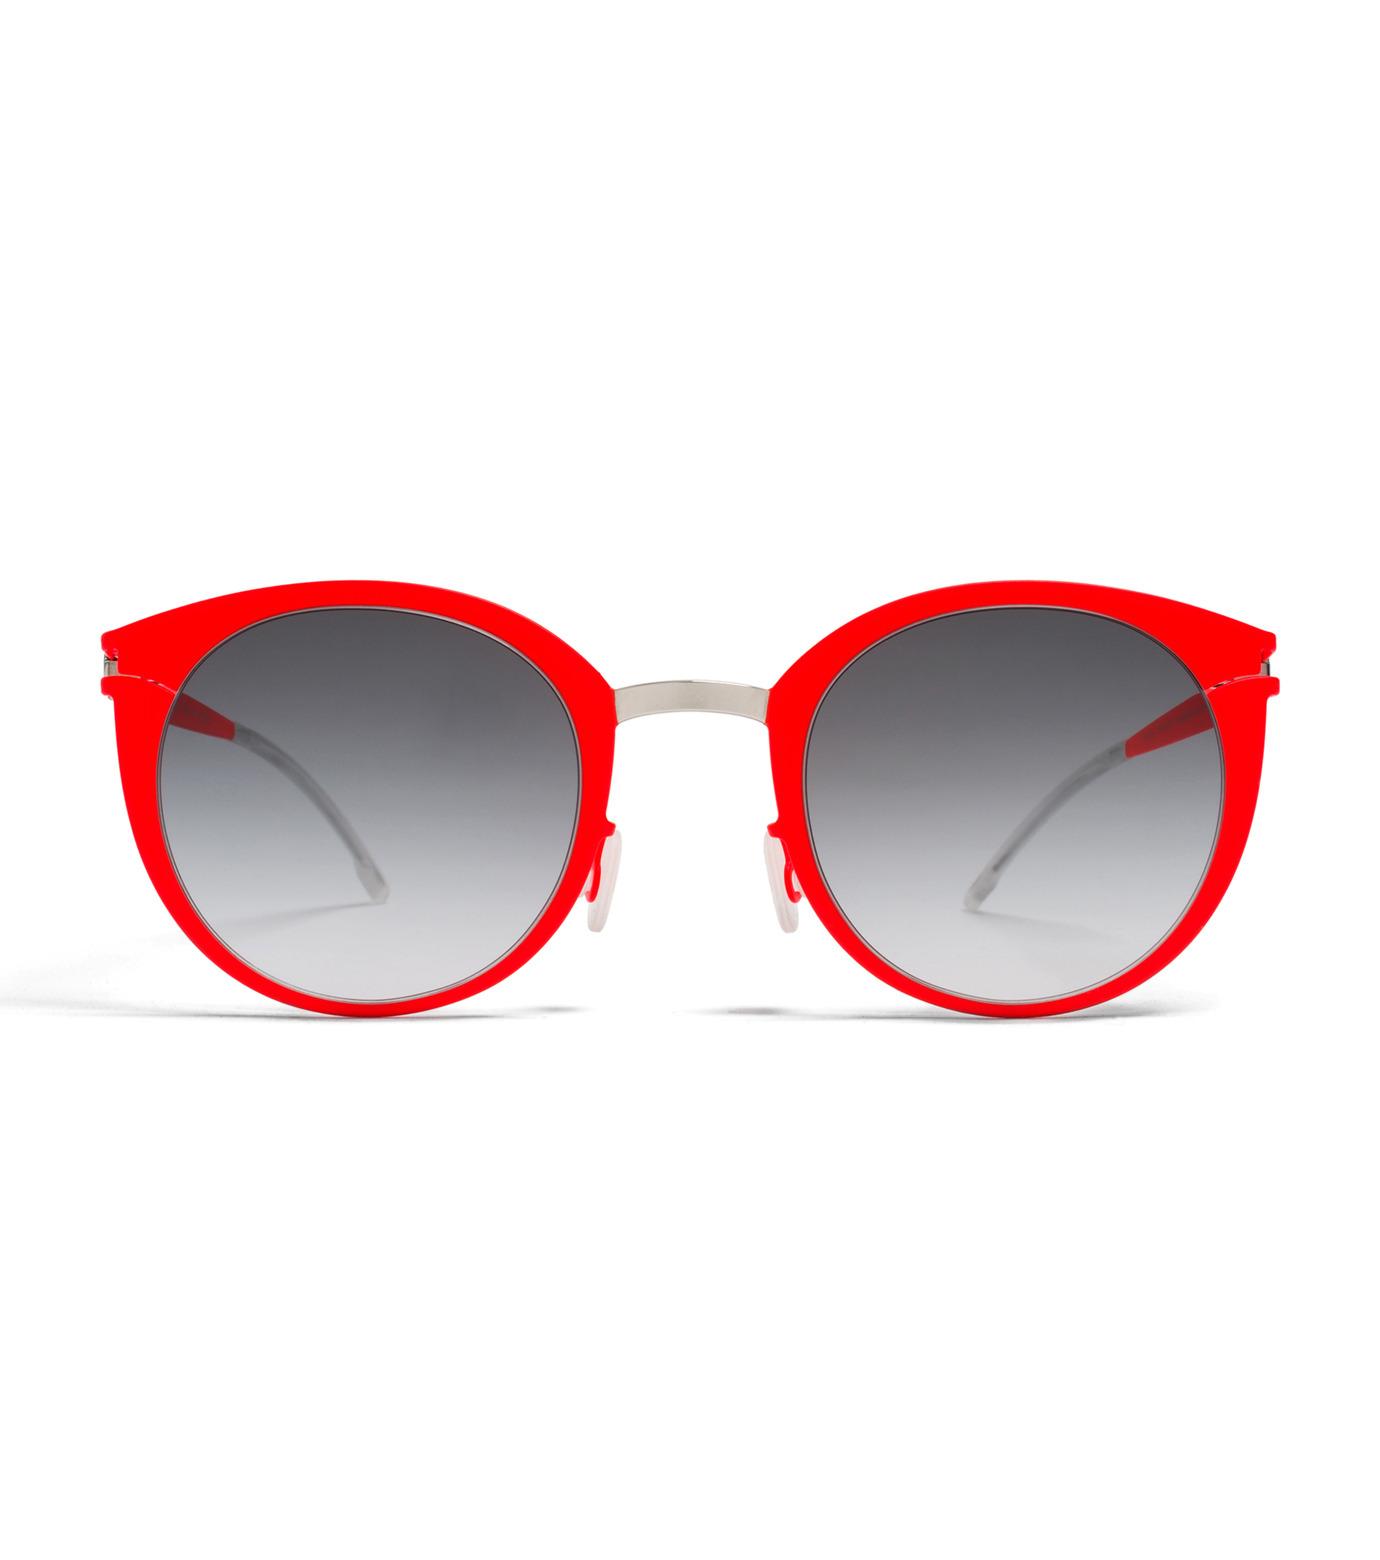 MYKITA(マイキータ)のDODO-RED(アイウェア/eyewear)-DODO-62 拡大詳細画像2